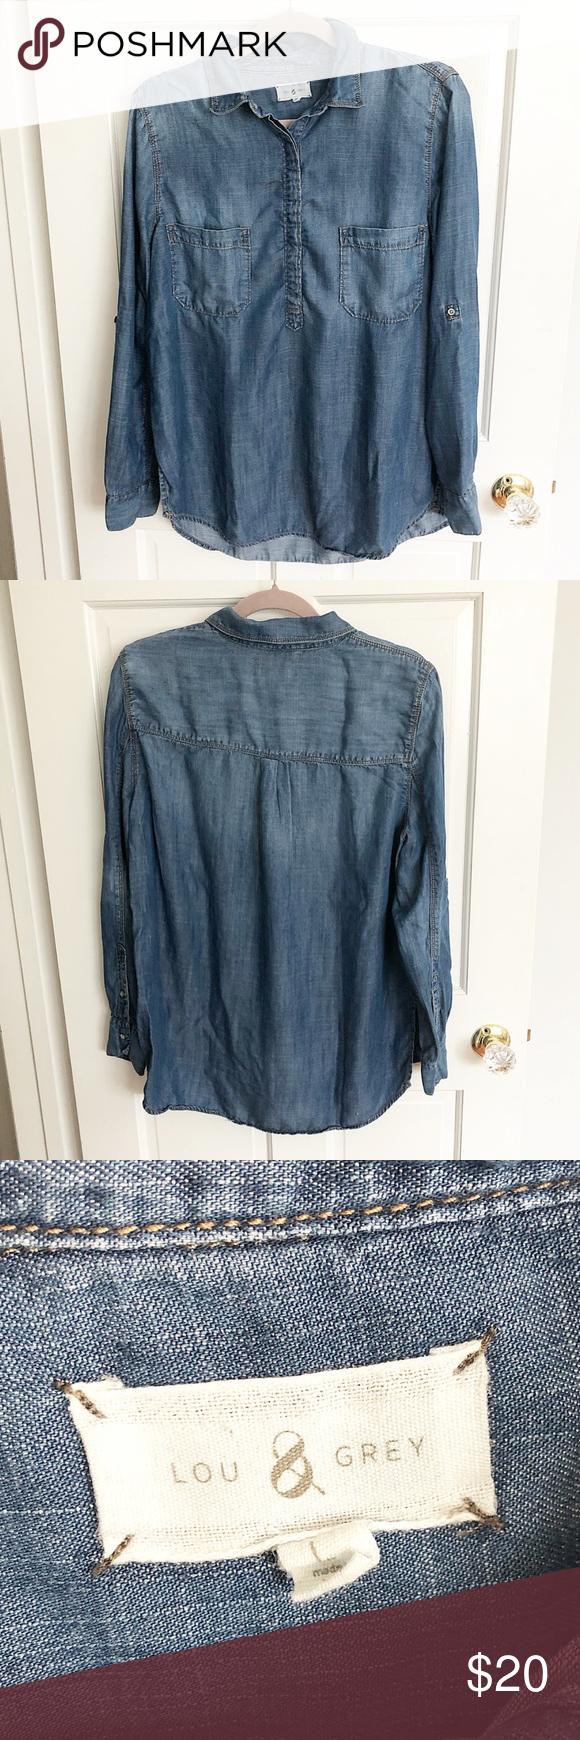 b76e9e0f Lou & Grey Denim Chambray Tunic Lou & Grey Denim Chambray Tunic Size Large  Great condition 100% Lyocell Lou & Grey Tops Button Down Shirts